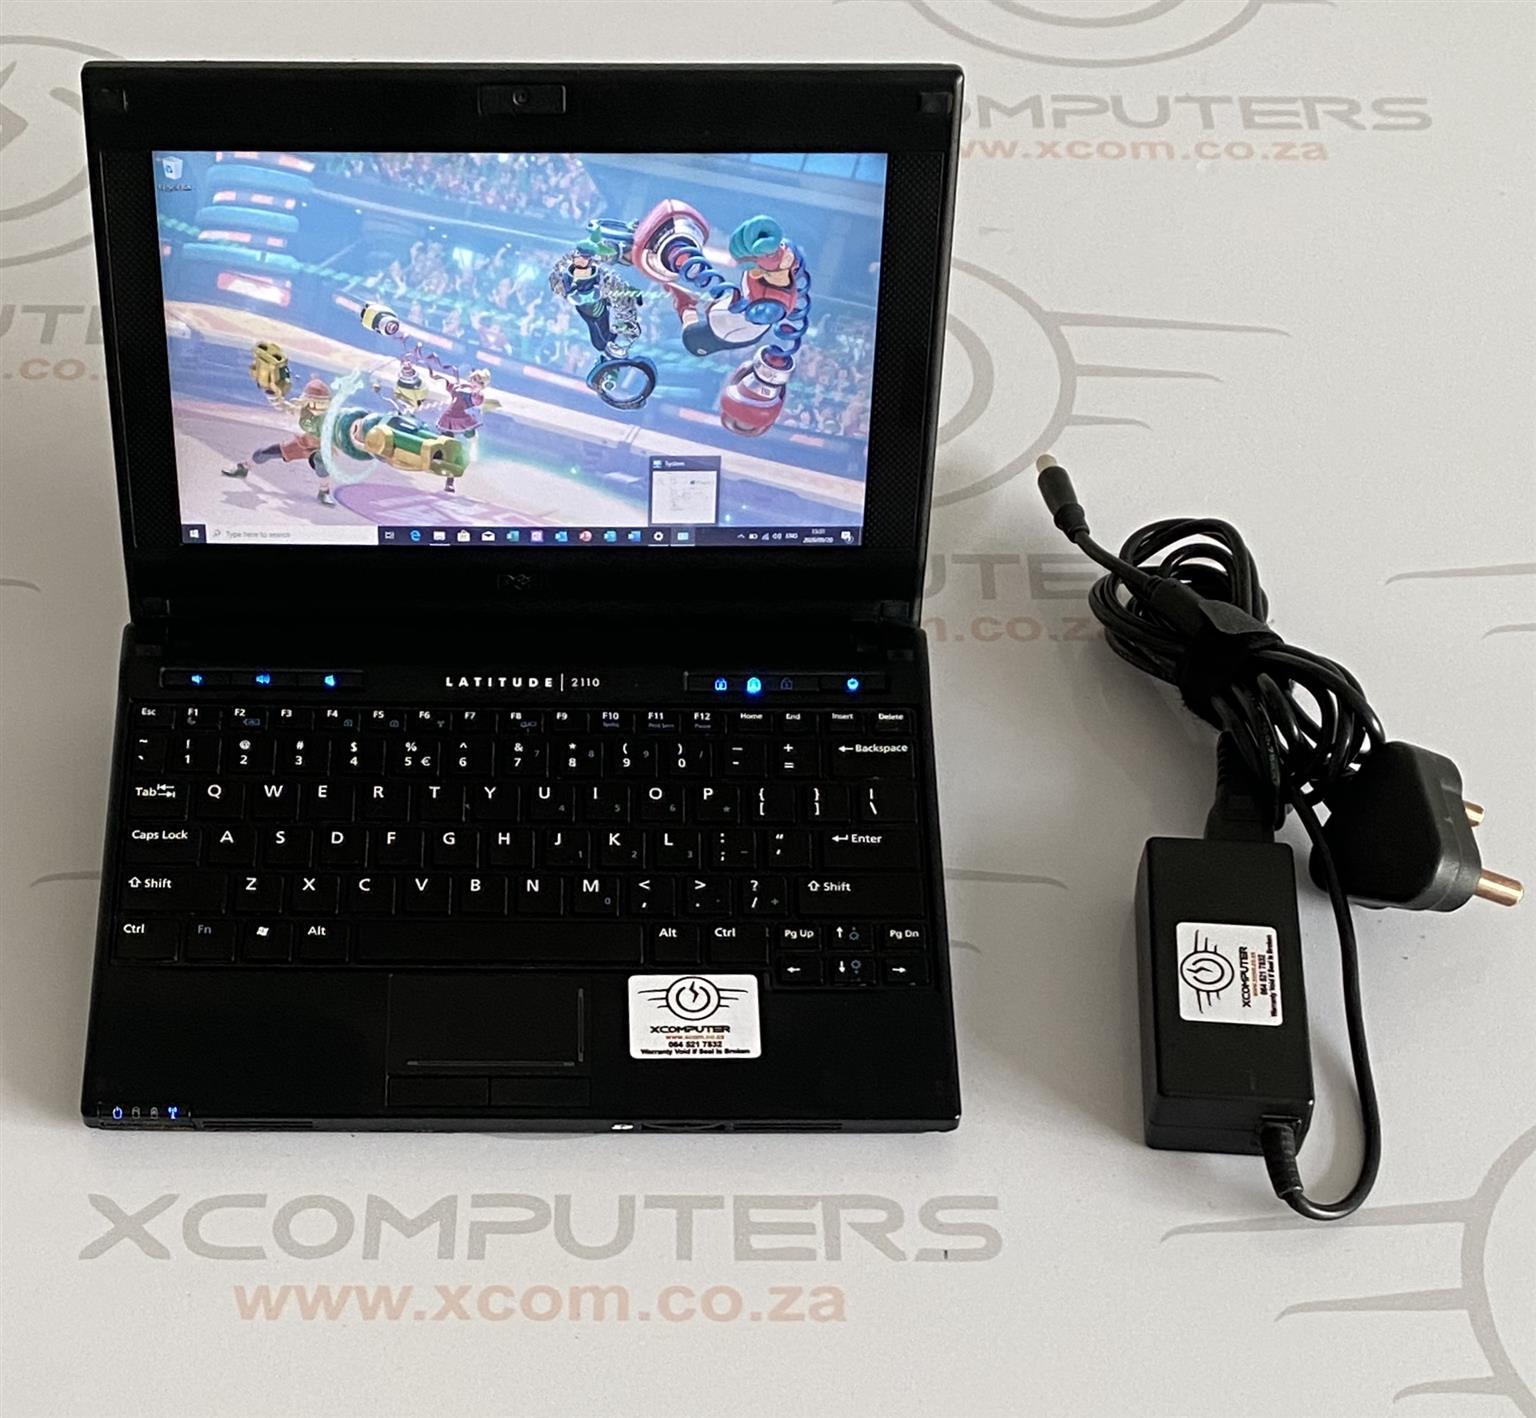 Dell Intel Atom Laptop R1700